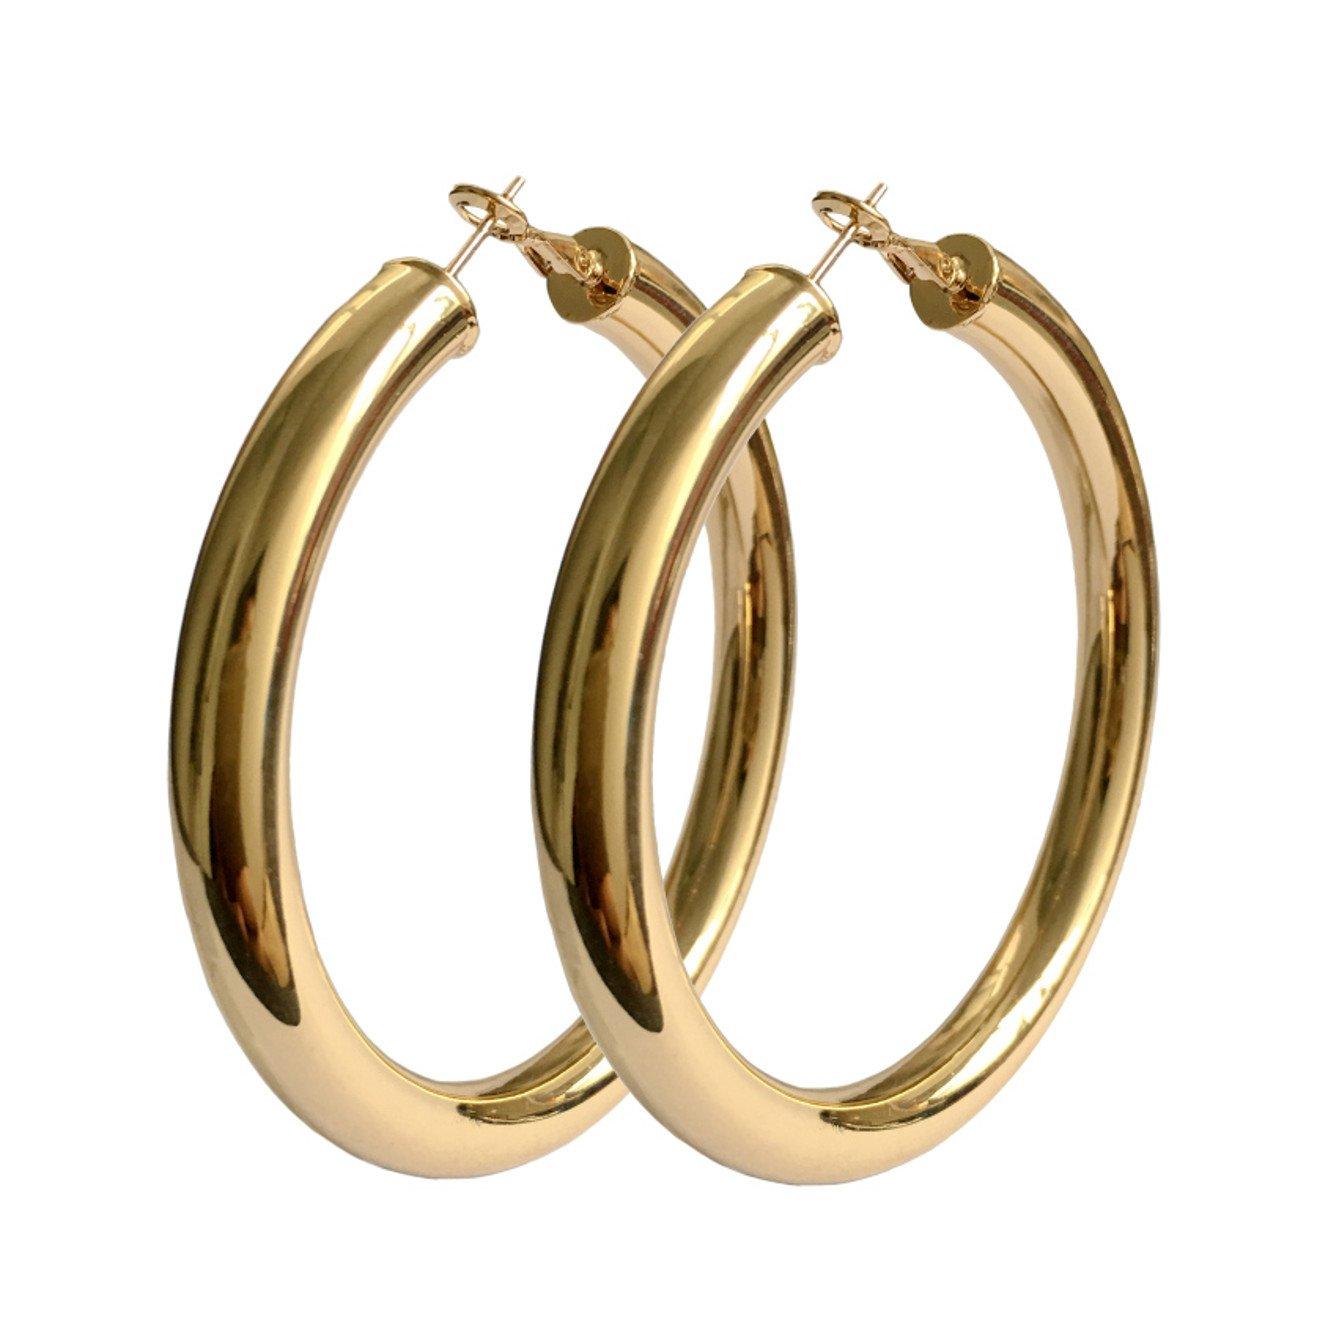 STAYJOY 18K Gold Polished Fashion High-profile Big Hoop Earrings with Omega Backs (LARGE)